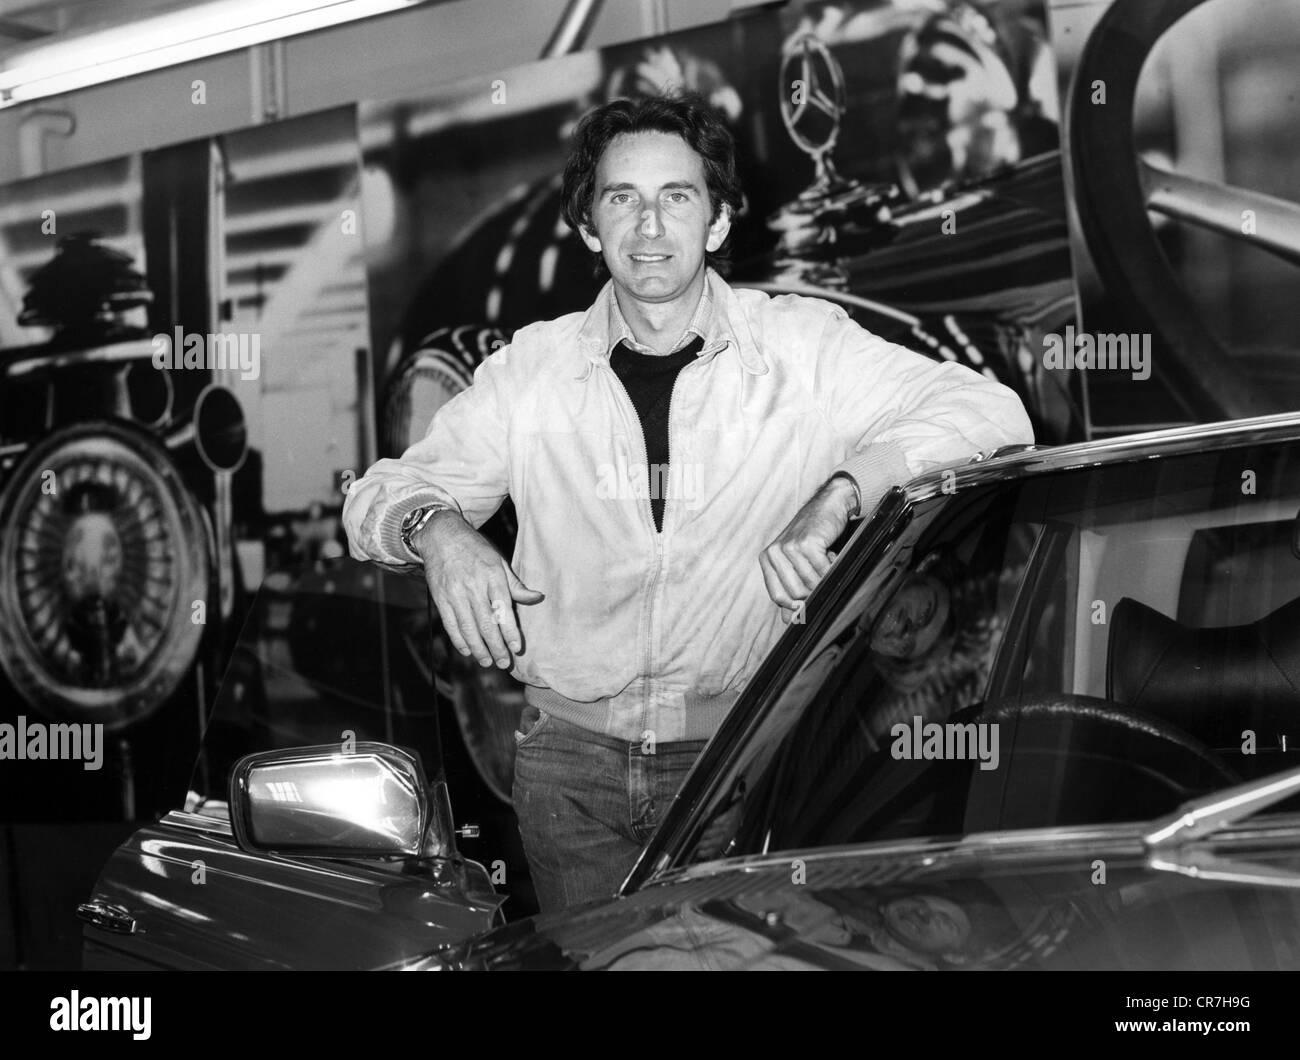 Watson, John Marshall 'Wattie', * 4.5.1946, Britisch racing driver, half length, 1990s, Additional-Rights - Stock Image